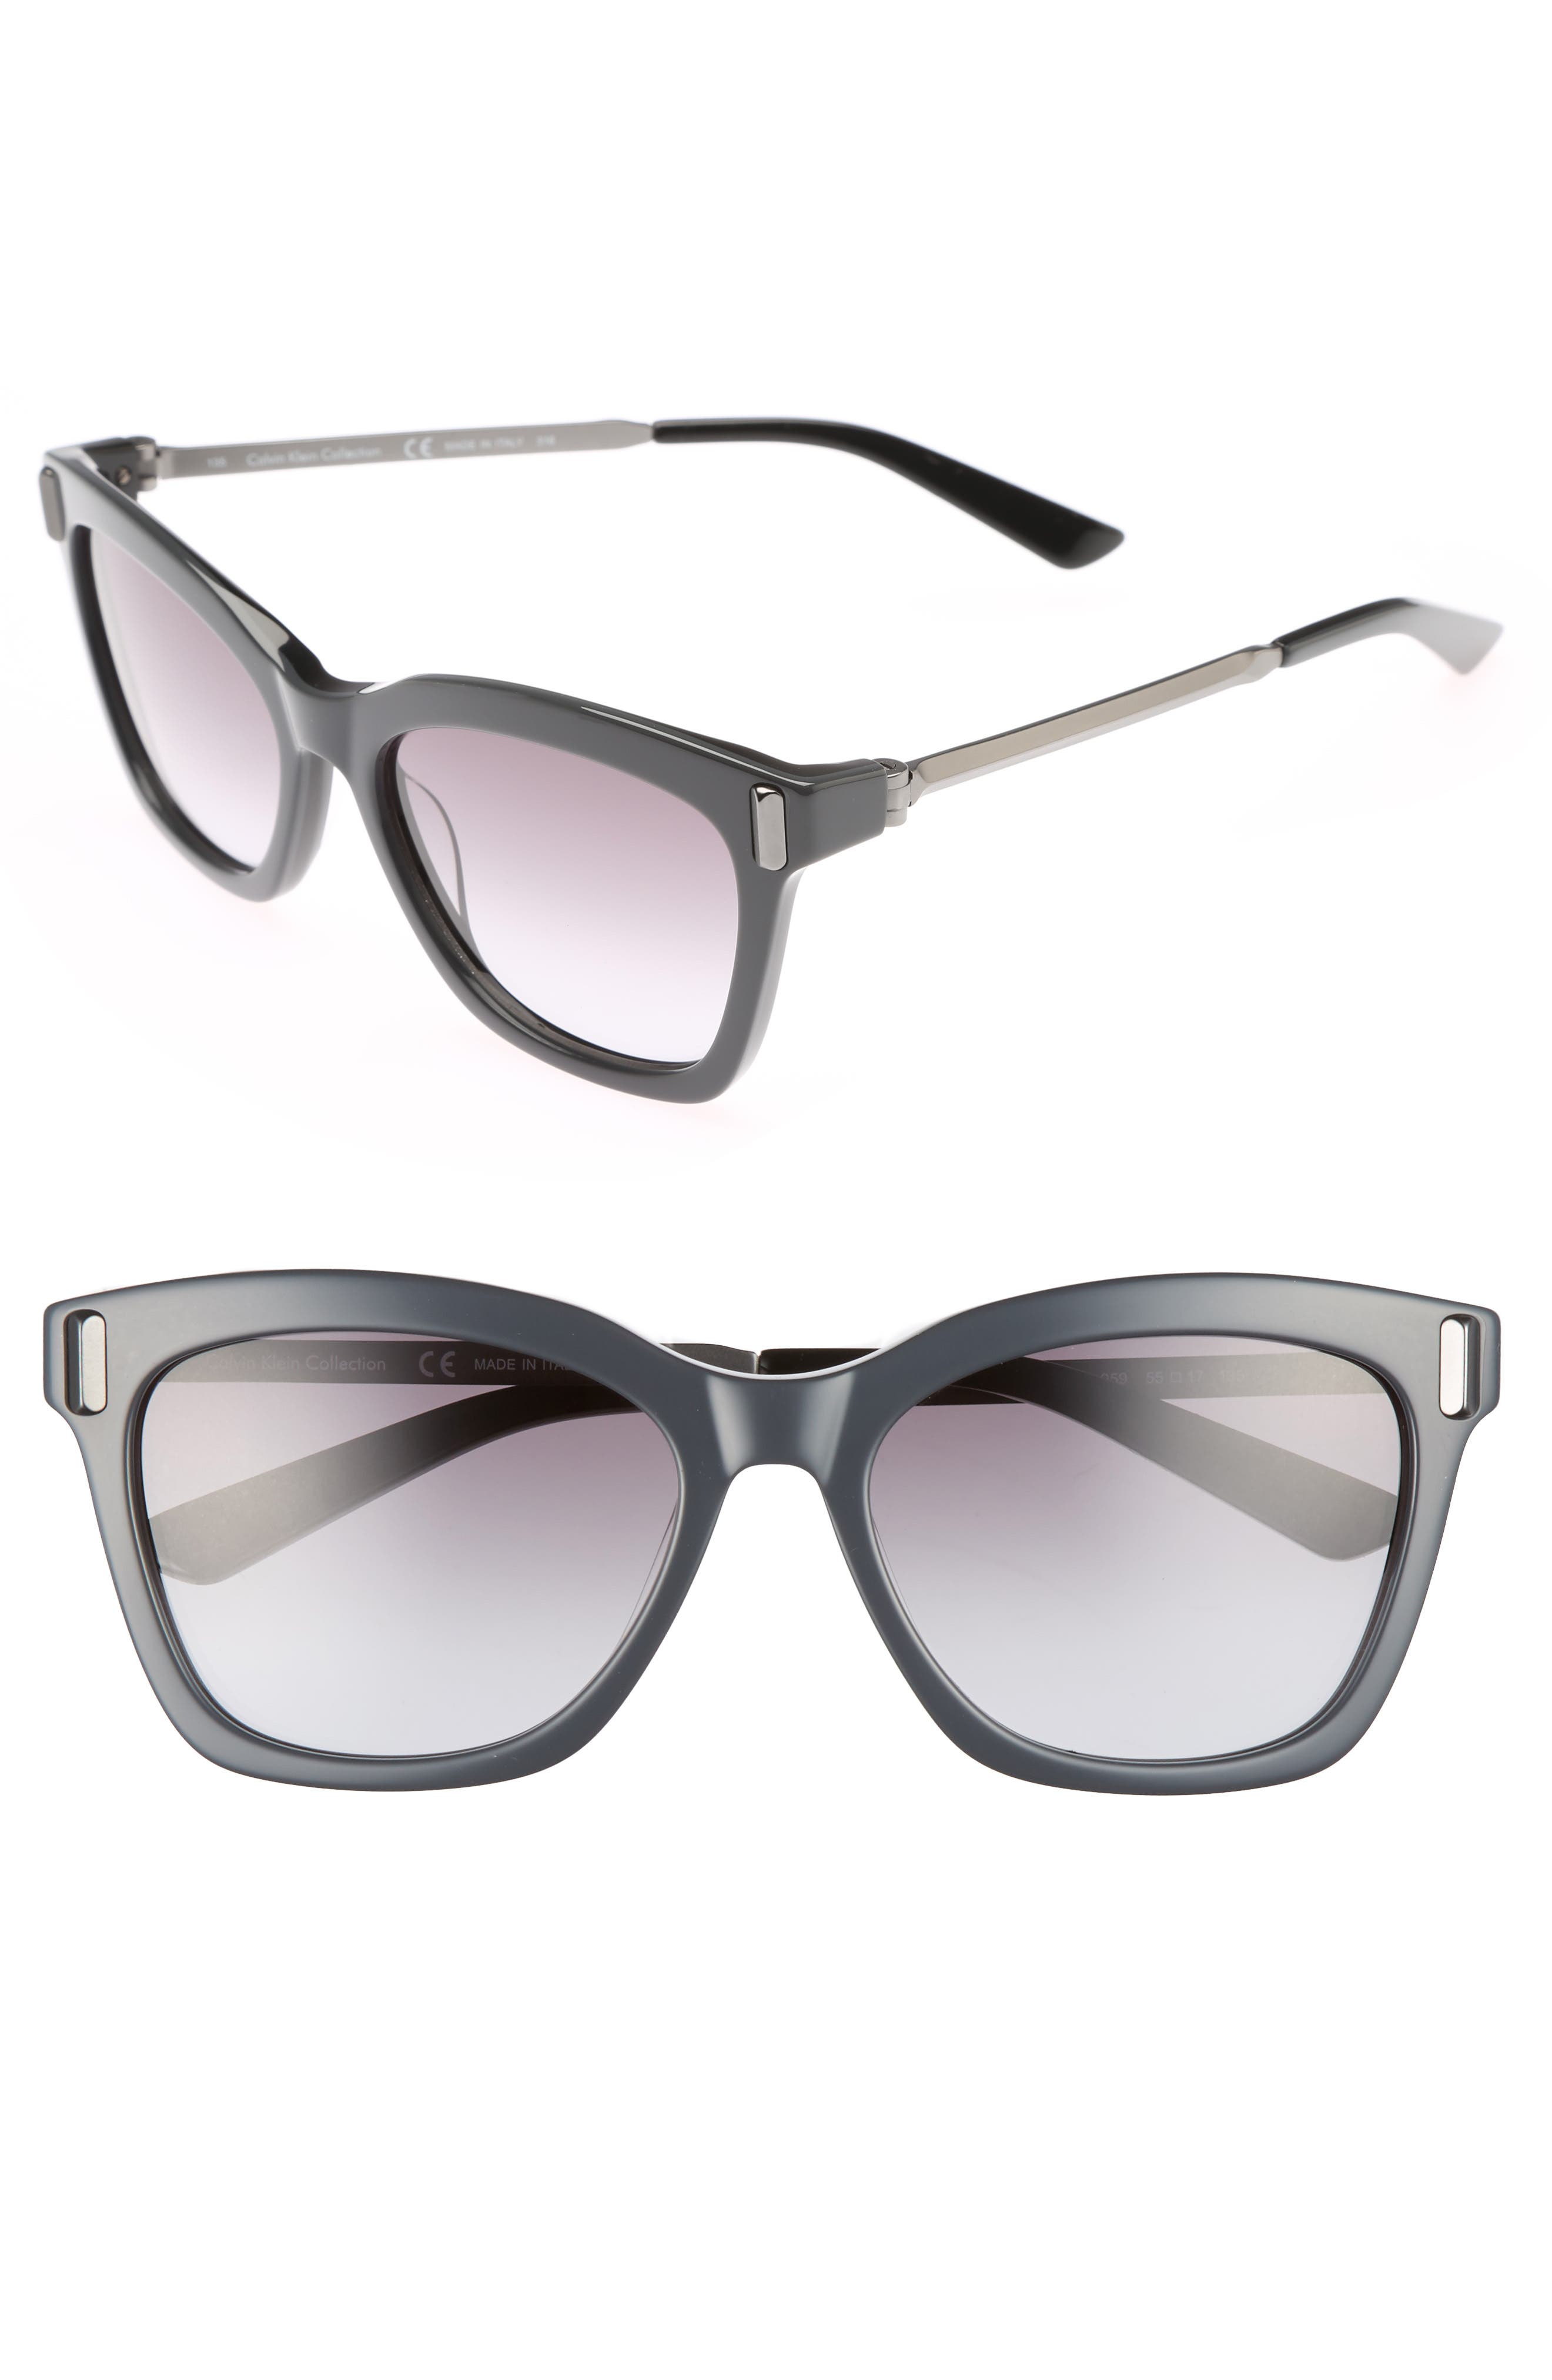 55mm Square Sunglasses,                         Main,                         color, Jet/ Black